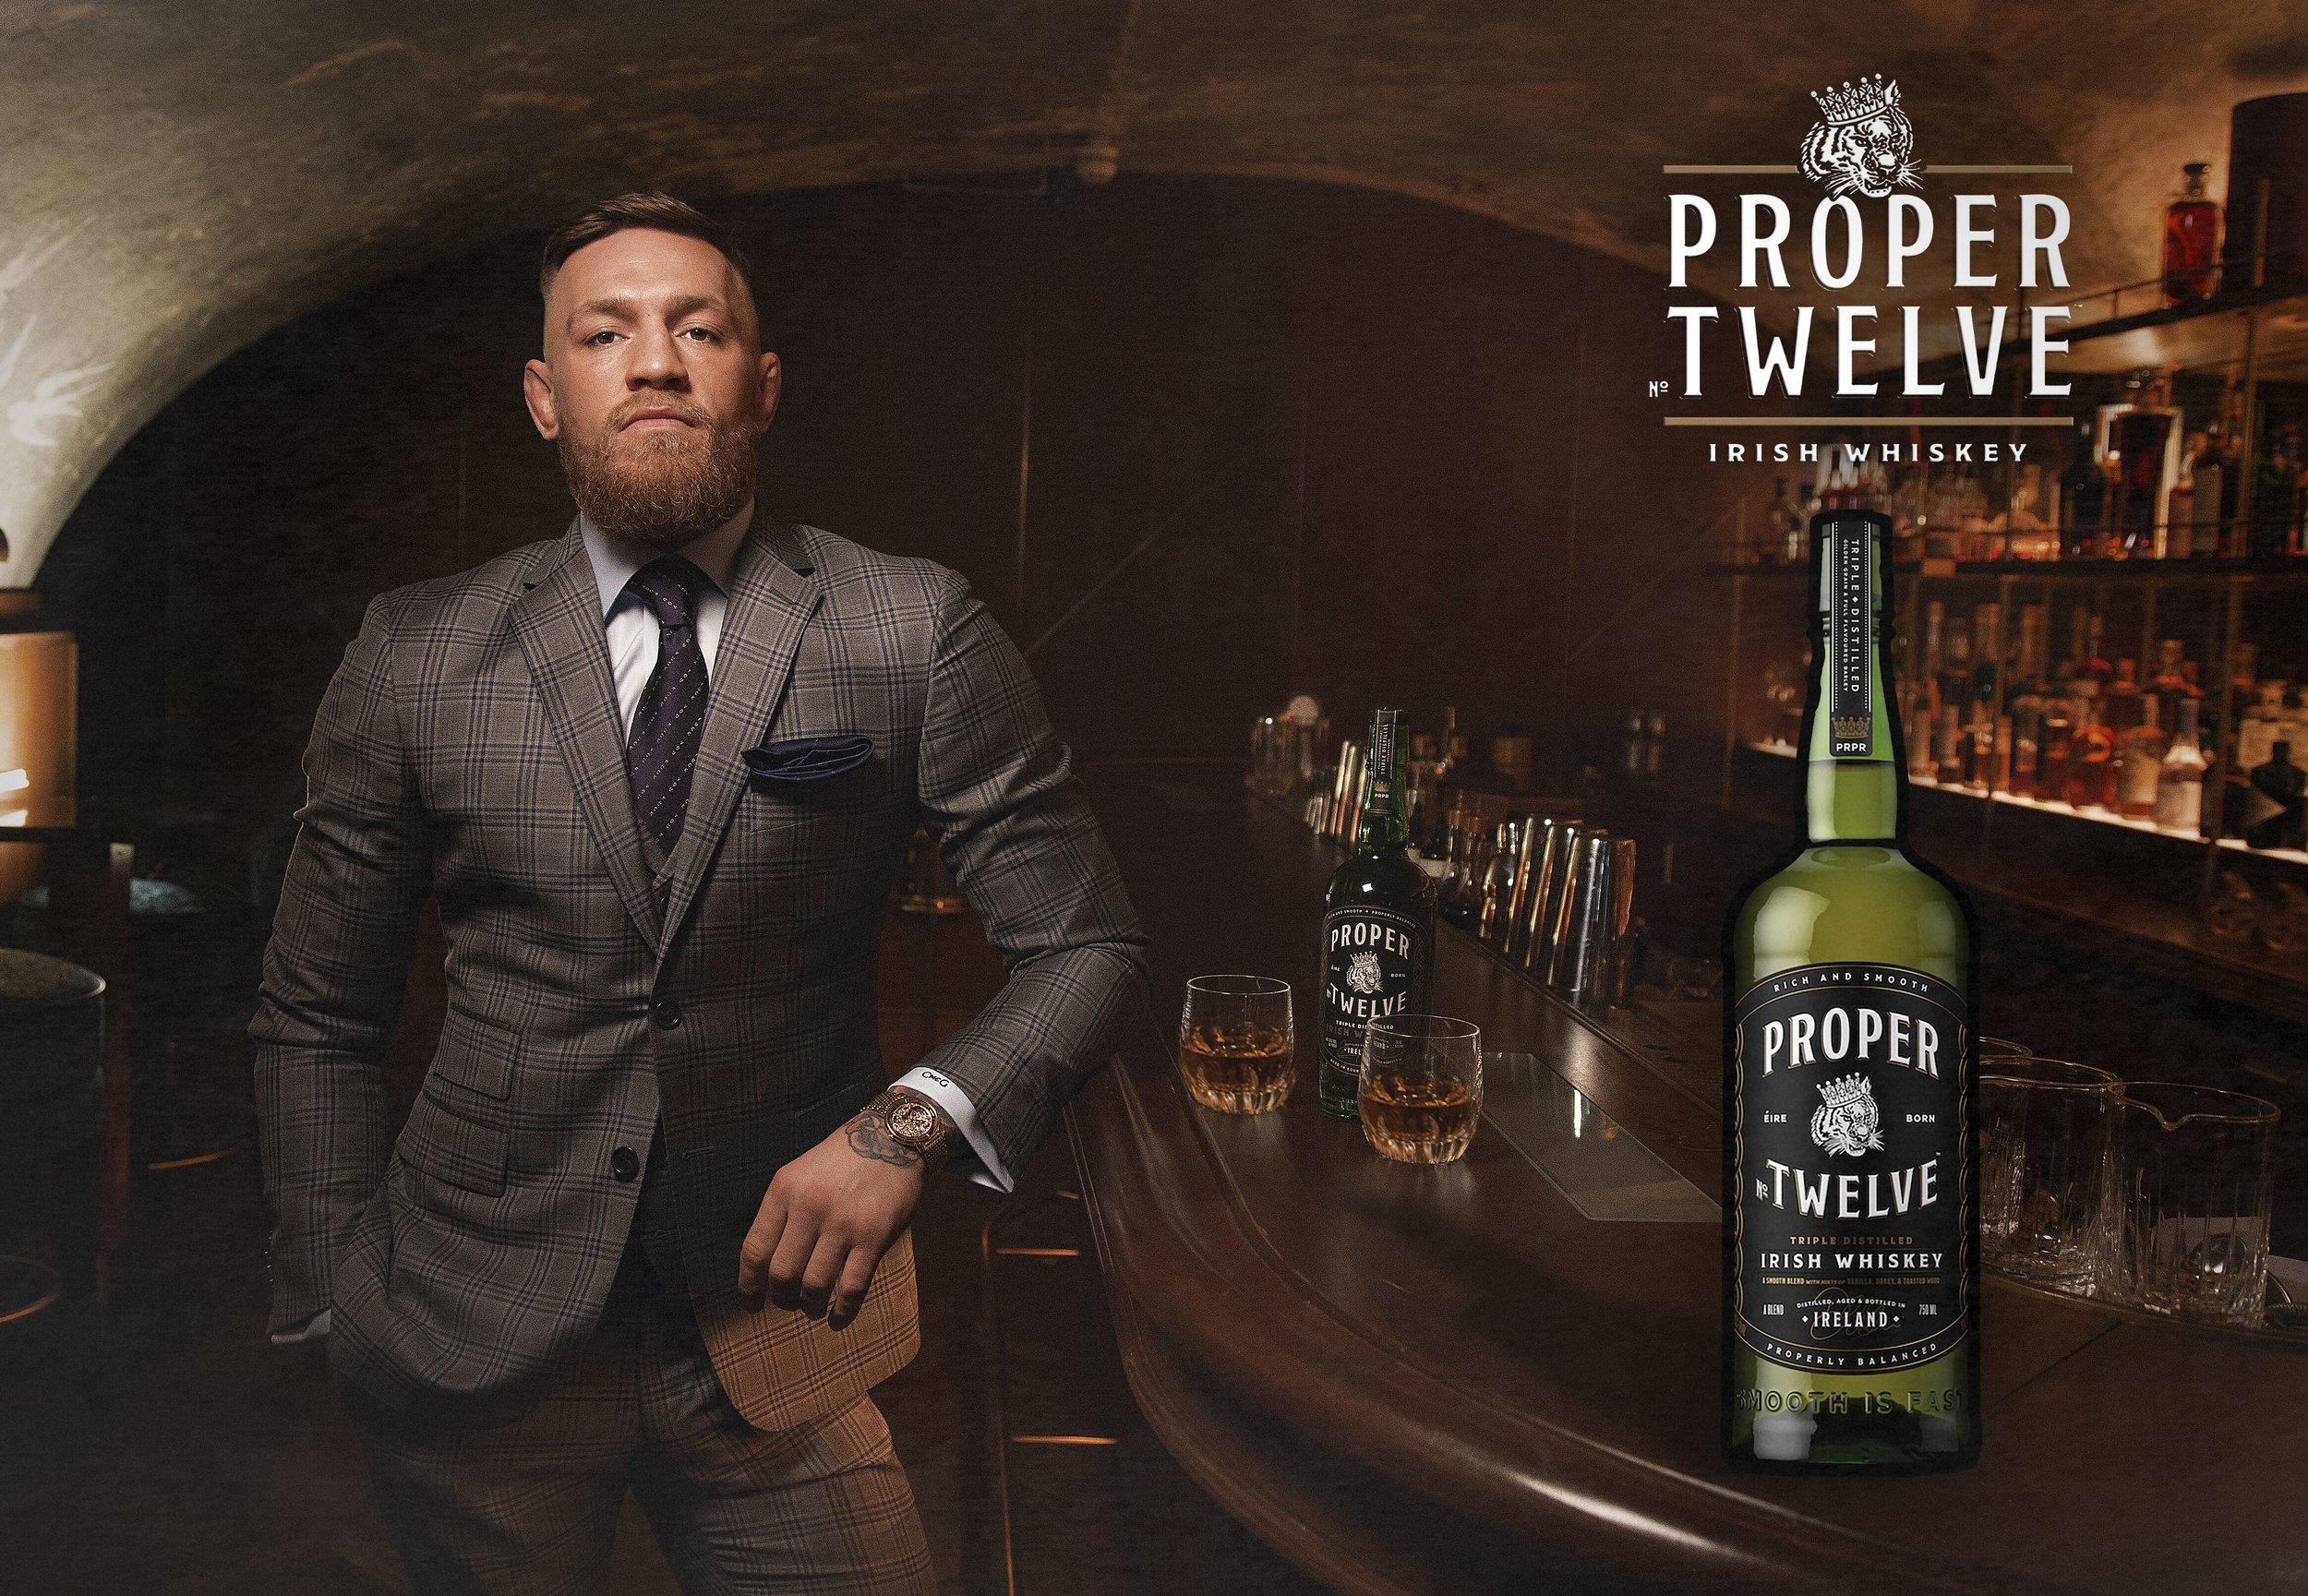 Conor McGregor 'Proper 12' Campaign 2018